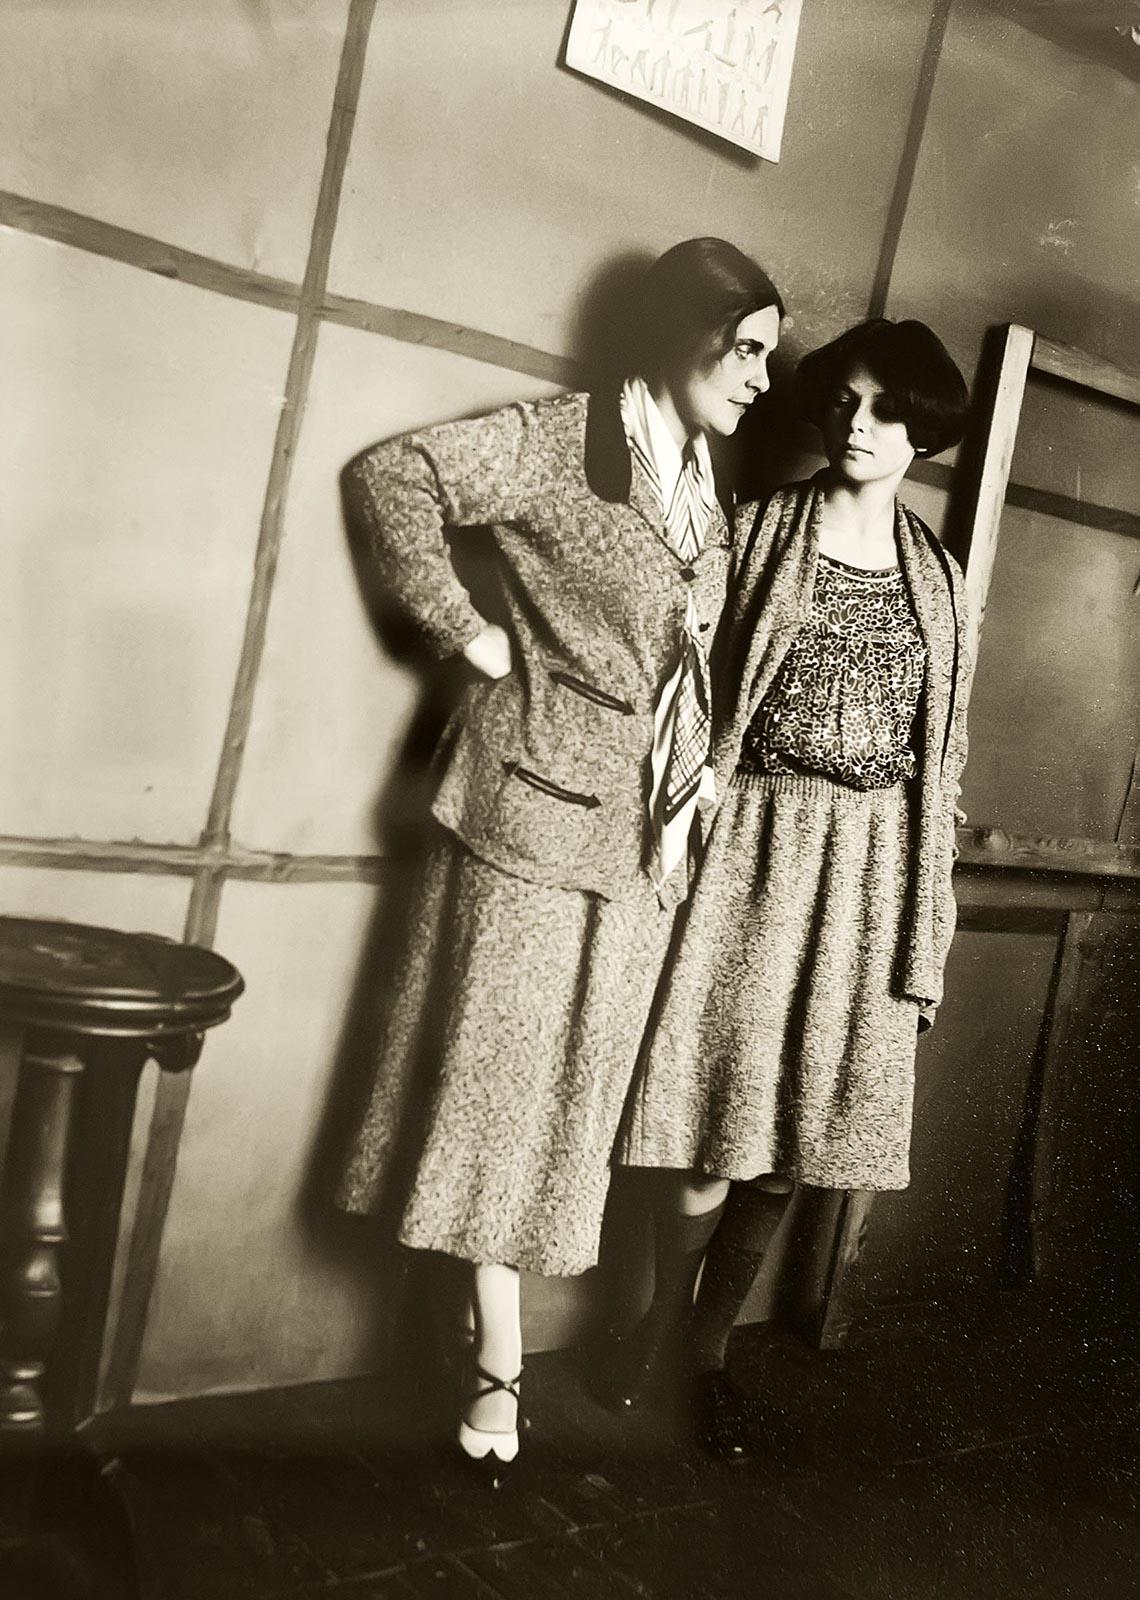 Фото №179311. Александр Родченко. Лиля Брик и Луэлла Краснощекова 1924